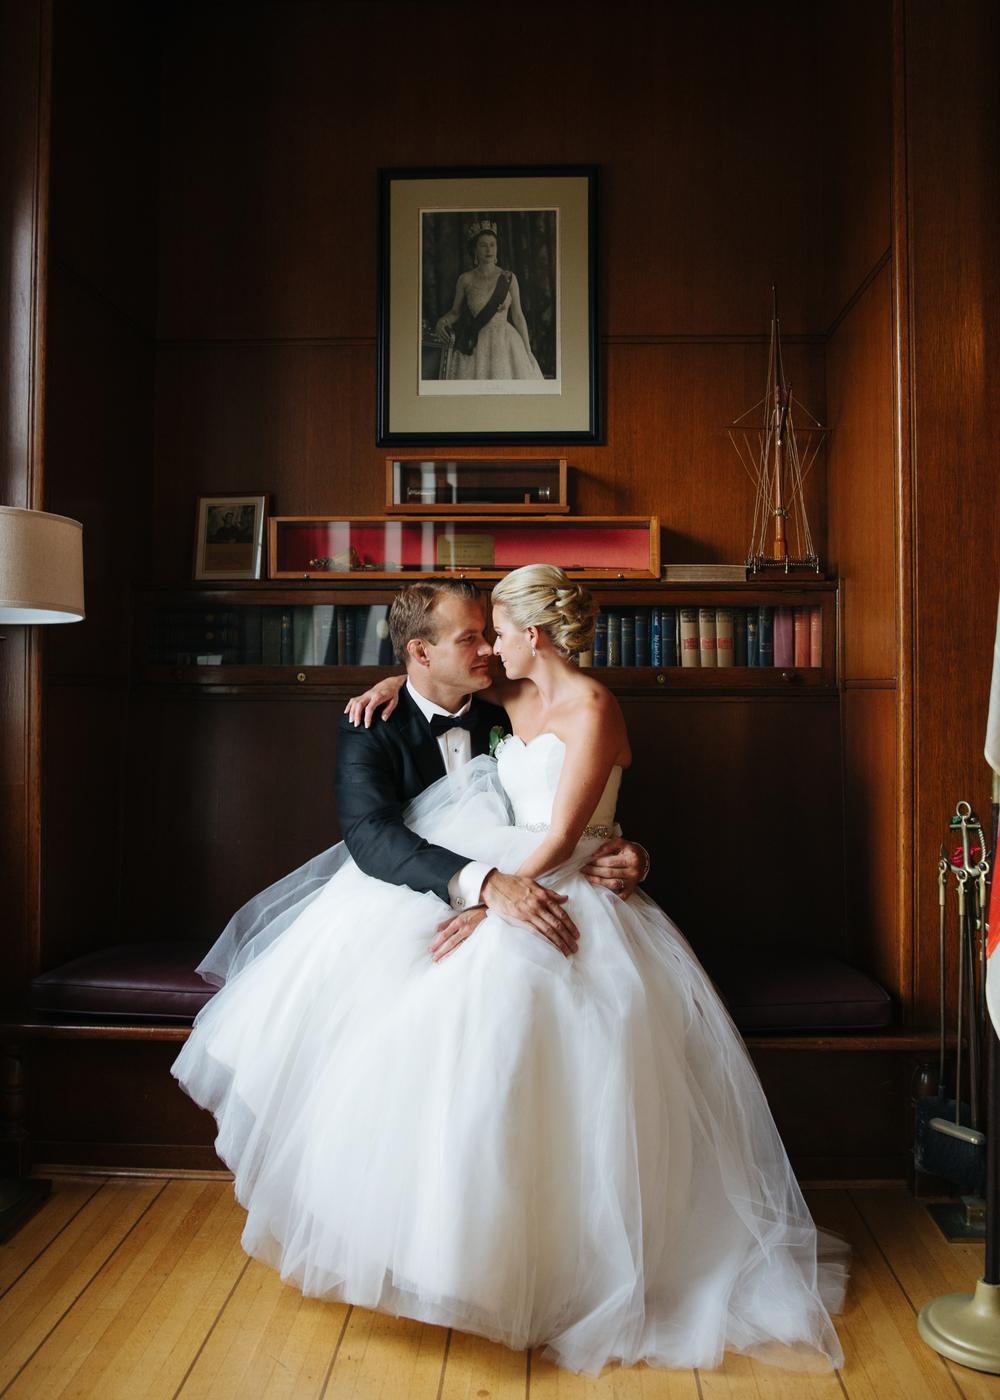 kaoverii_silva_photographer_via-herafilms_kelly_mike_wedding-25.jpg